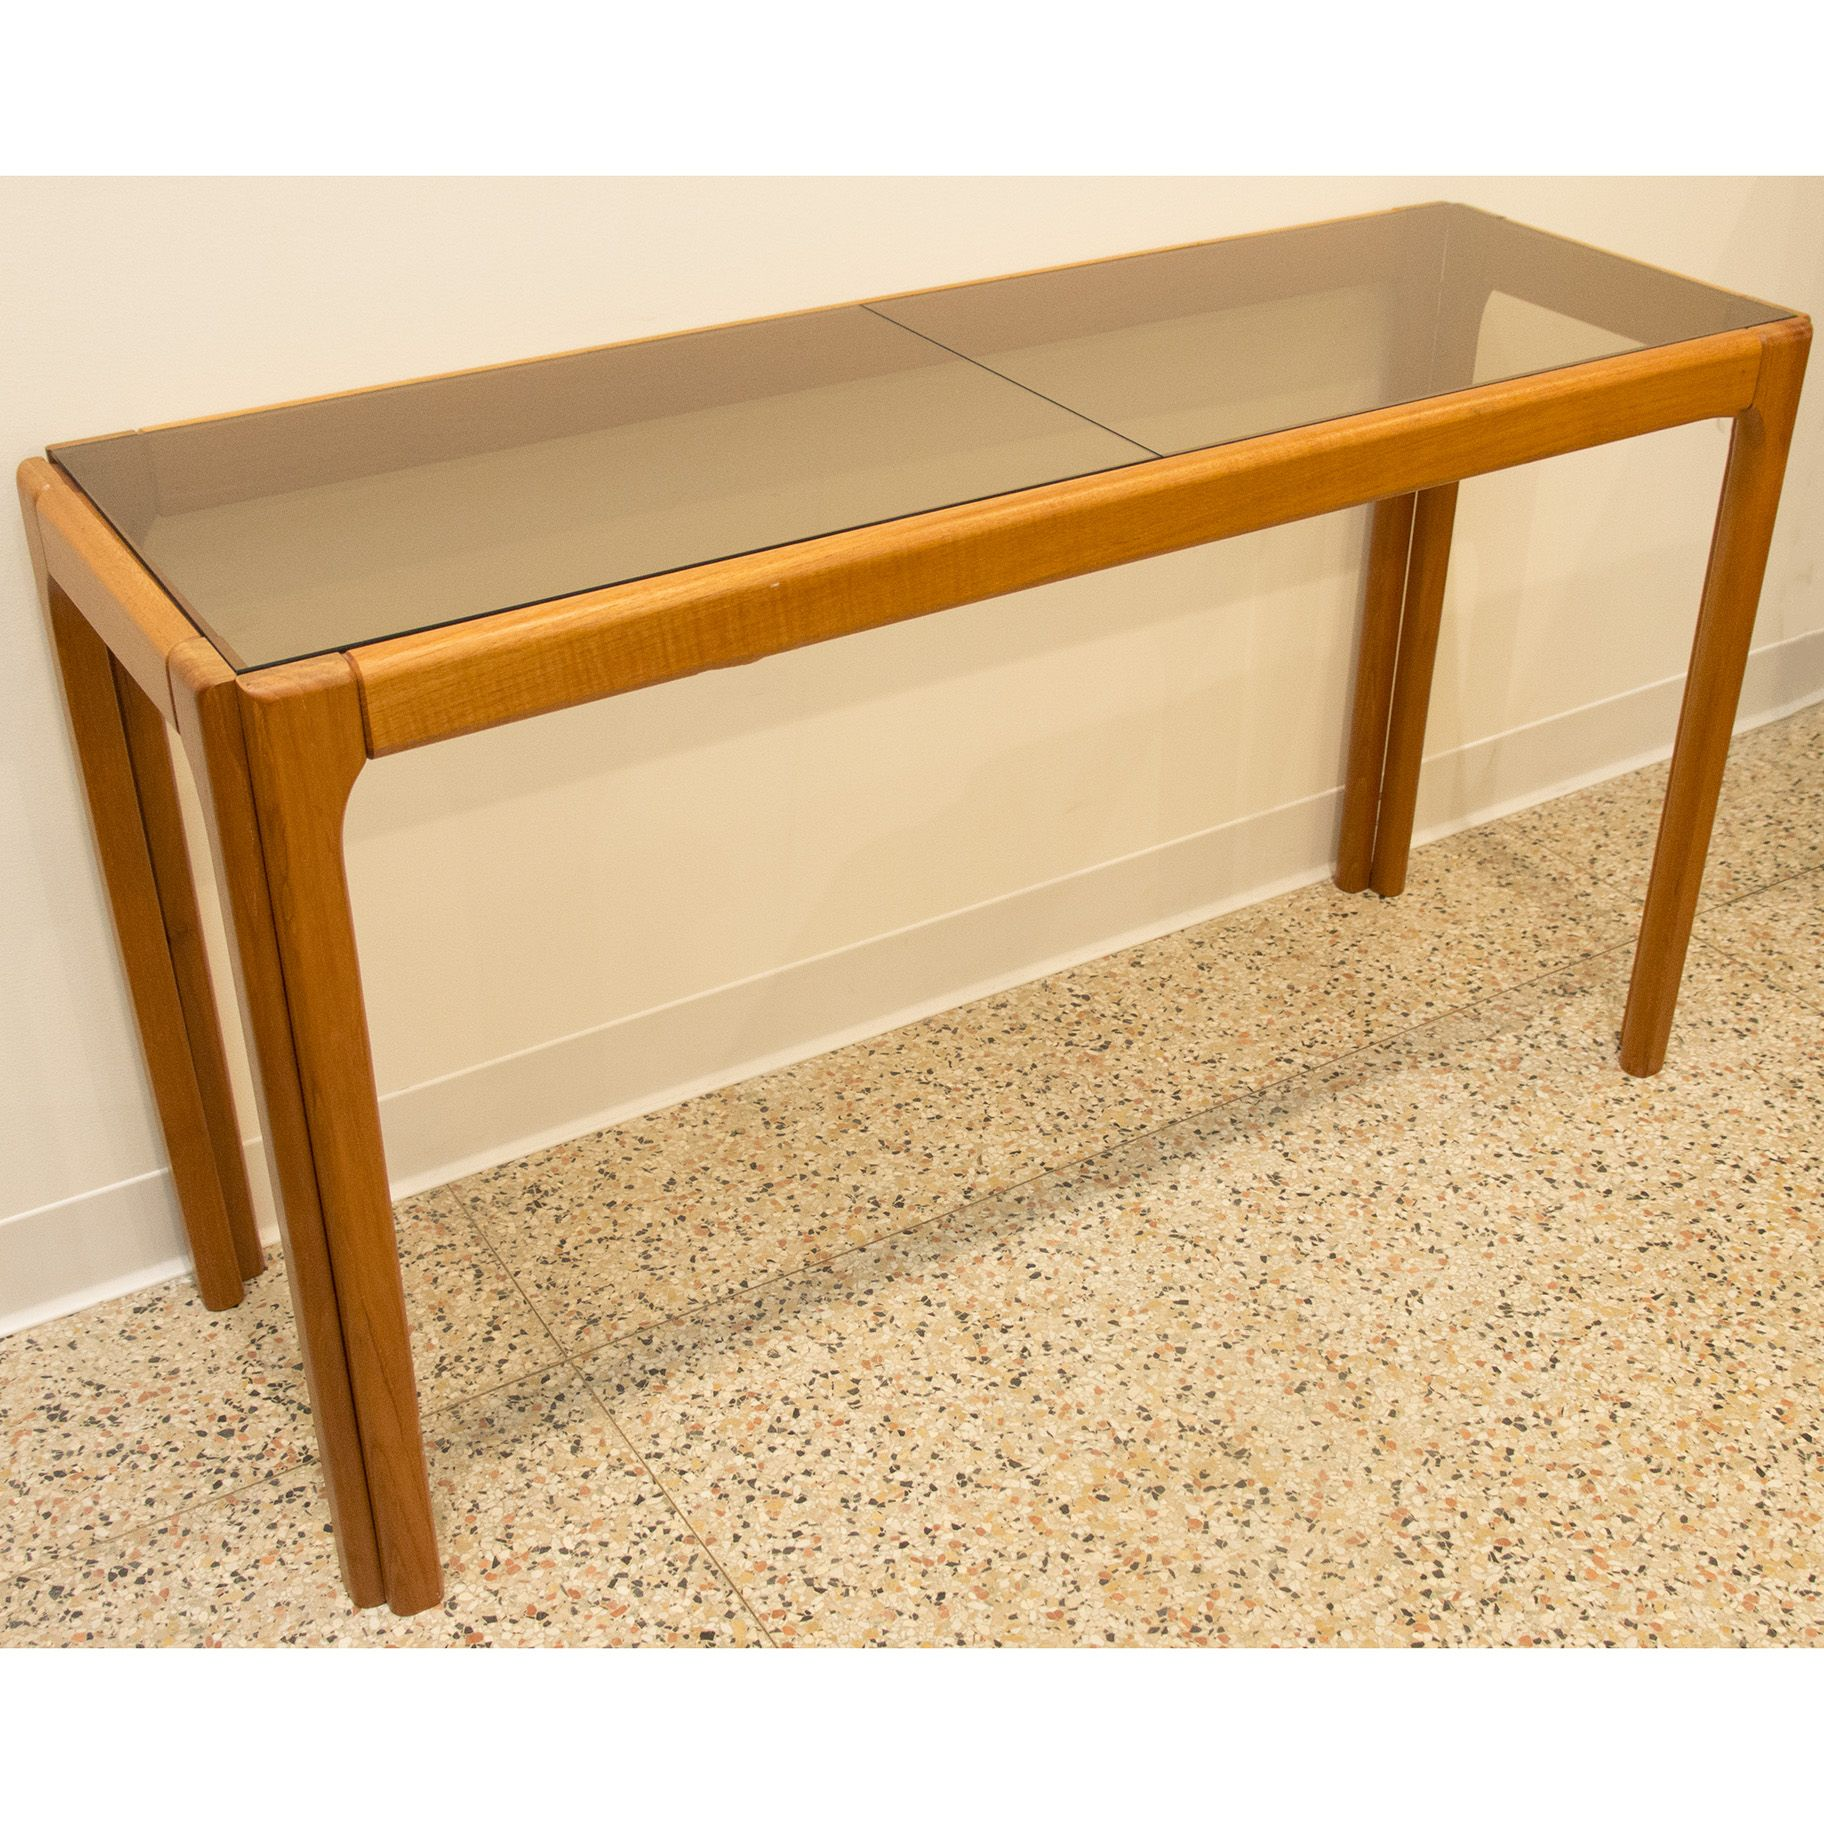 Teak Sofa Table Wine Danish Modern Console With Smoked Glass Top Mid Century